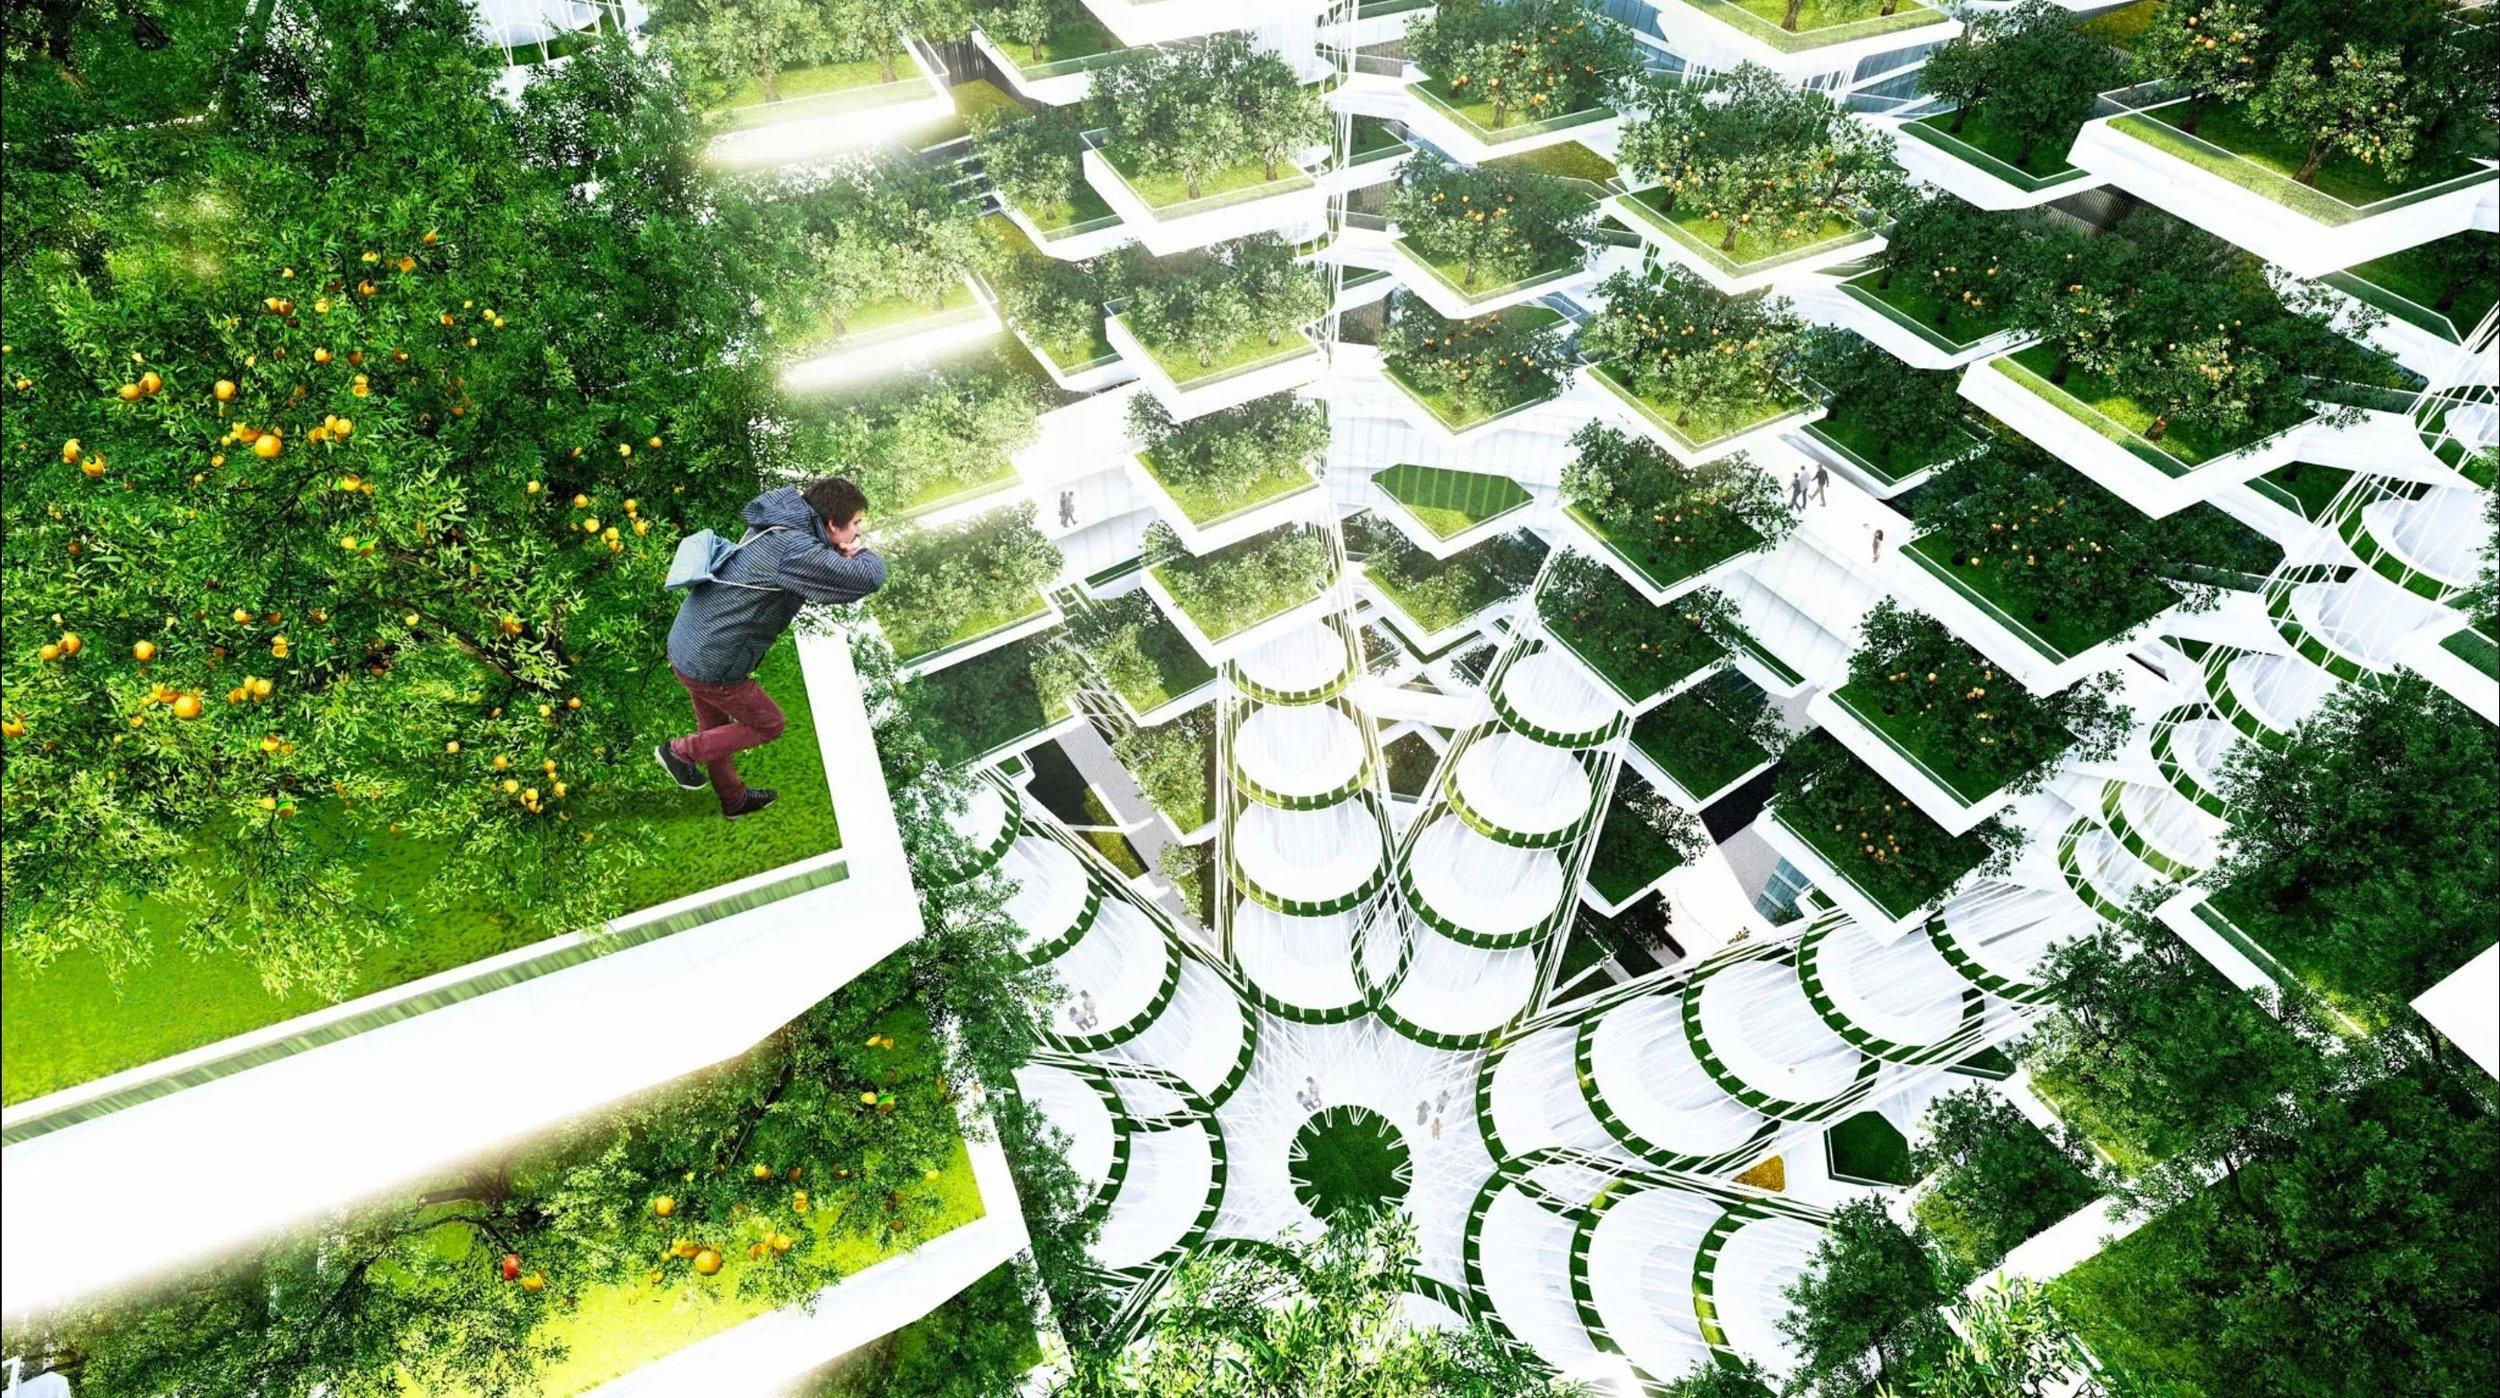 The  Urban Skyfarm  by Aprilli Design Studio,  a vertical farm design proposal for a site located in downtown Seoul.